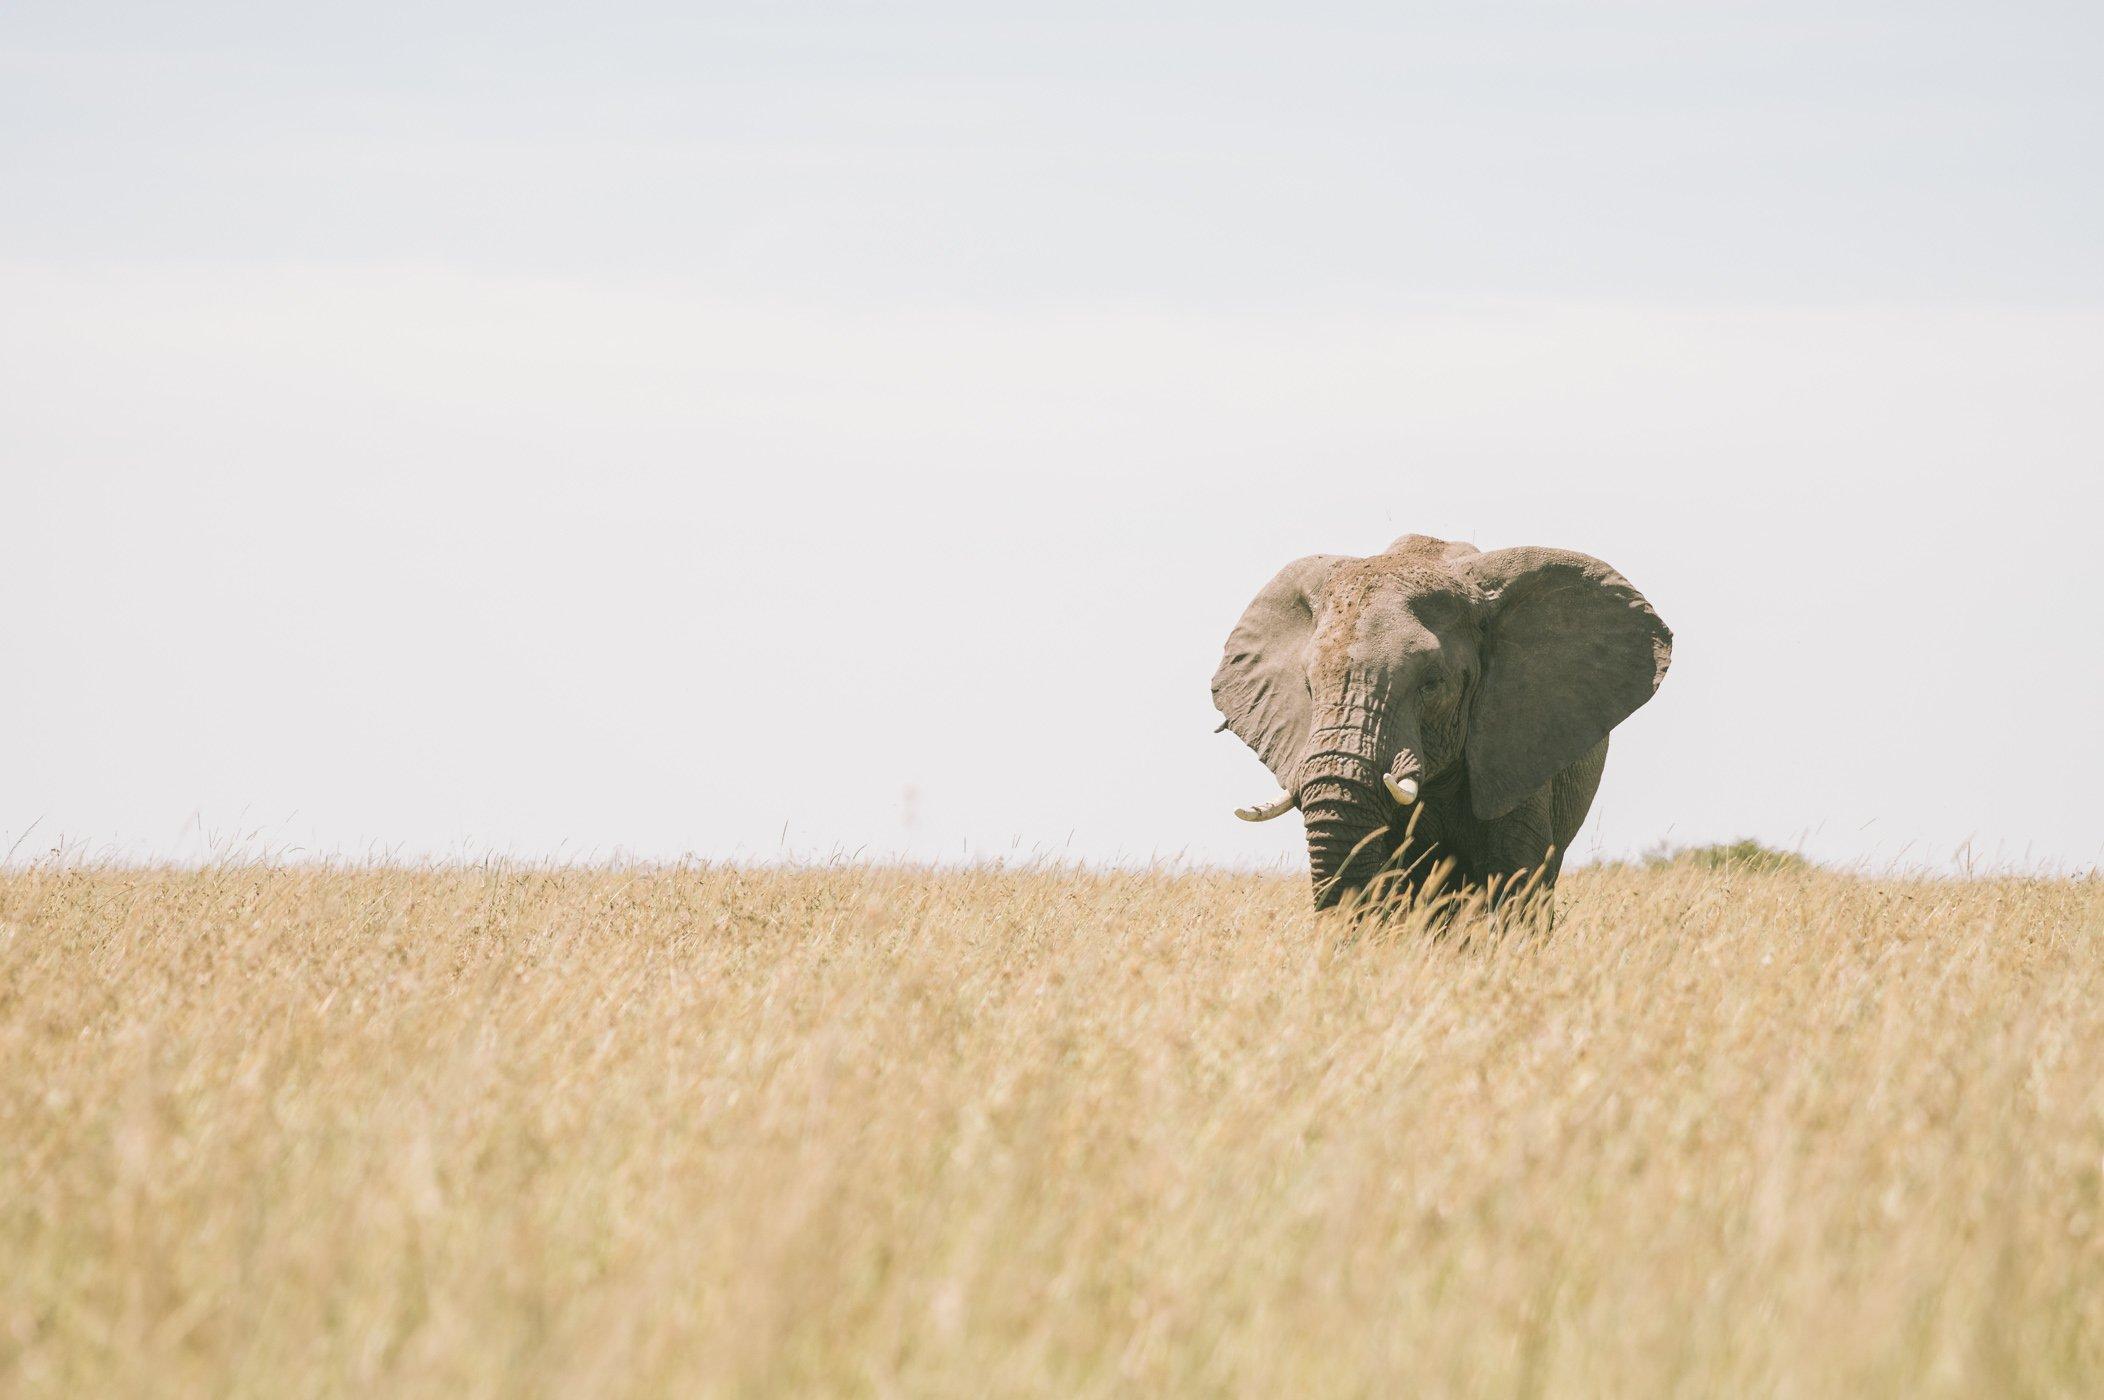 Elephant in the Maasai Mara in January